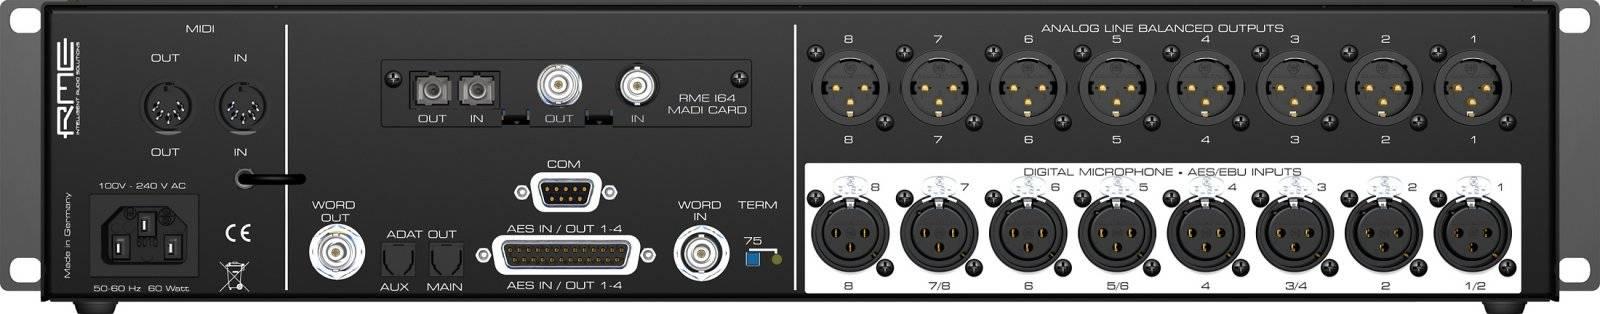 RME DMC842 8-Channel Digital Mic Preamp dmc-842 Product Image 3